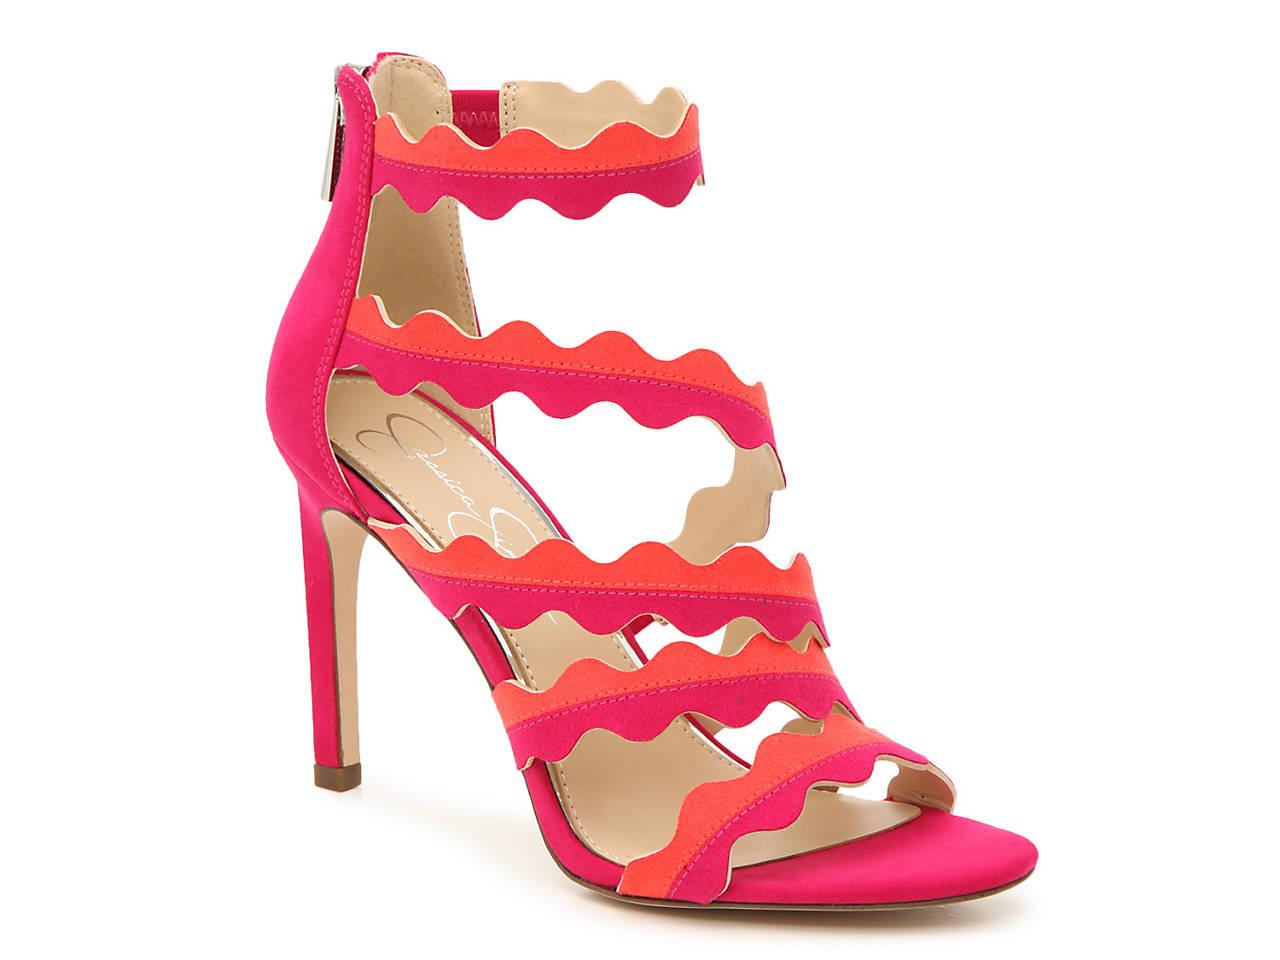 ebb3b57011 Jessica Simpson Caveena Sandal Women s Shoes